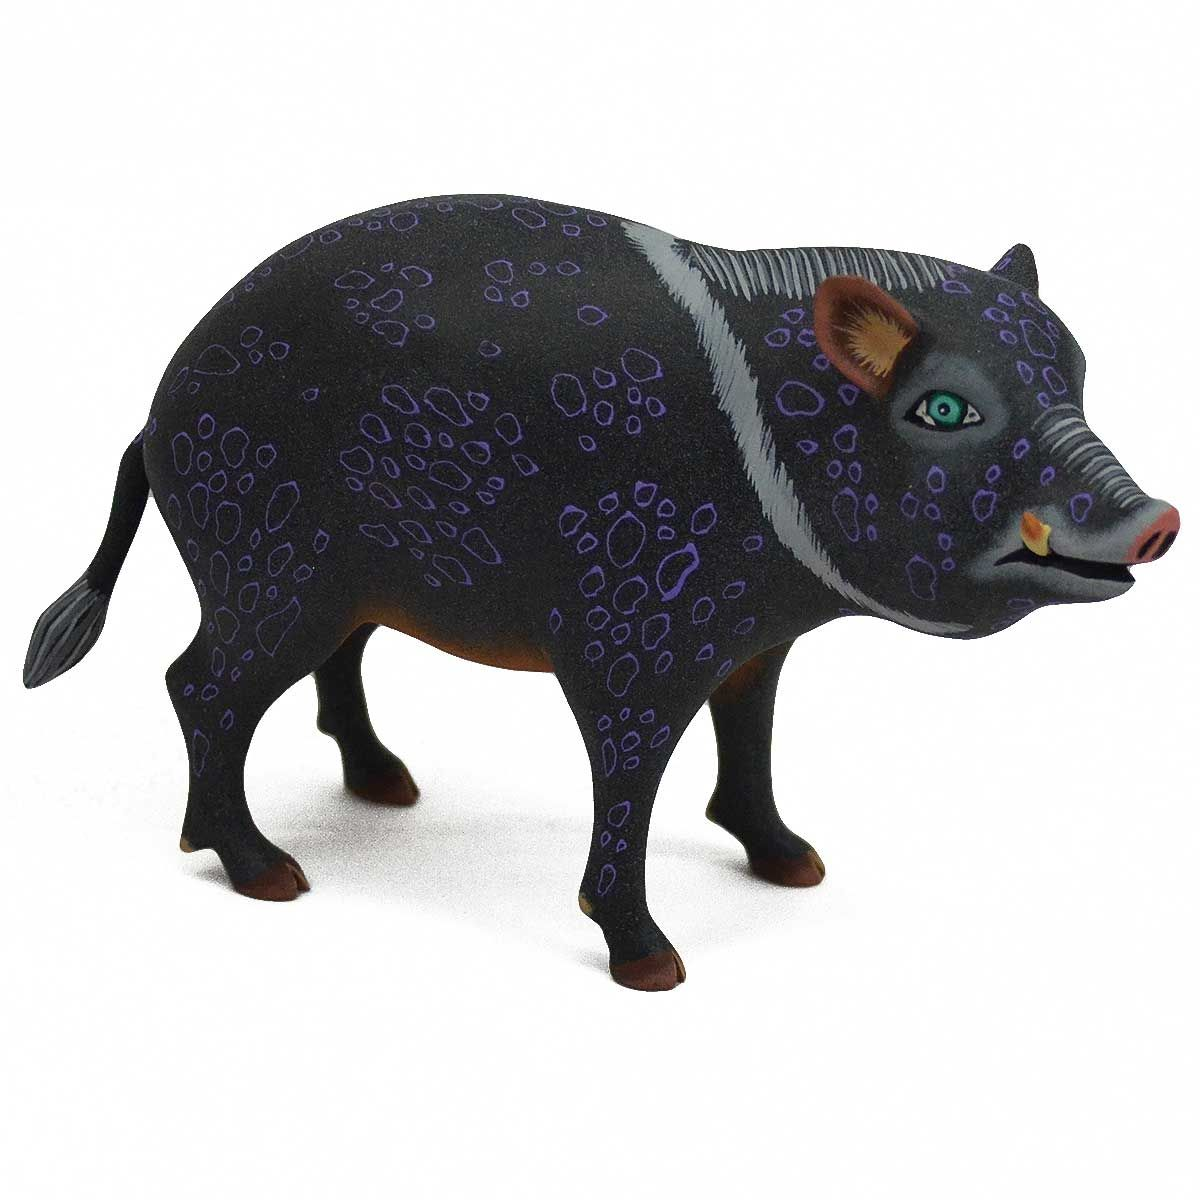 Eleazar Morales Javelina Oaxacan Animals Pinterest  # Muebles Pedro Linares